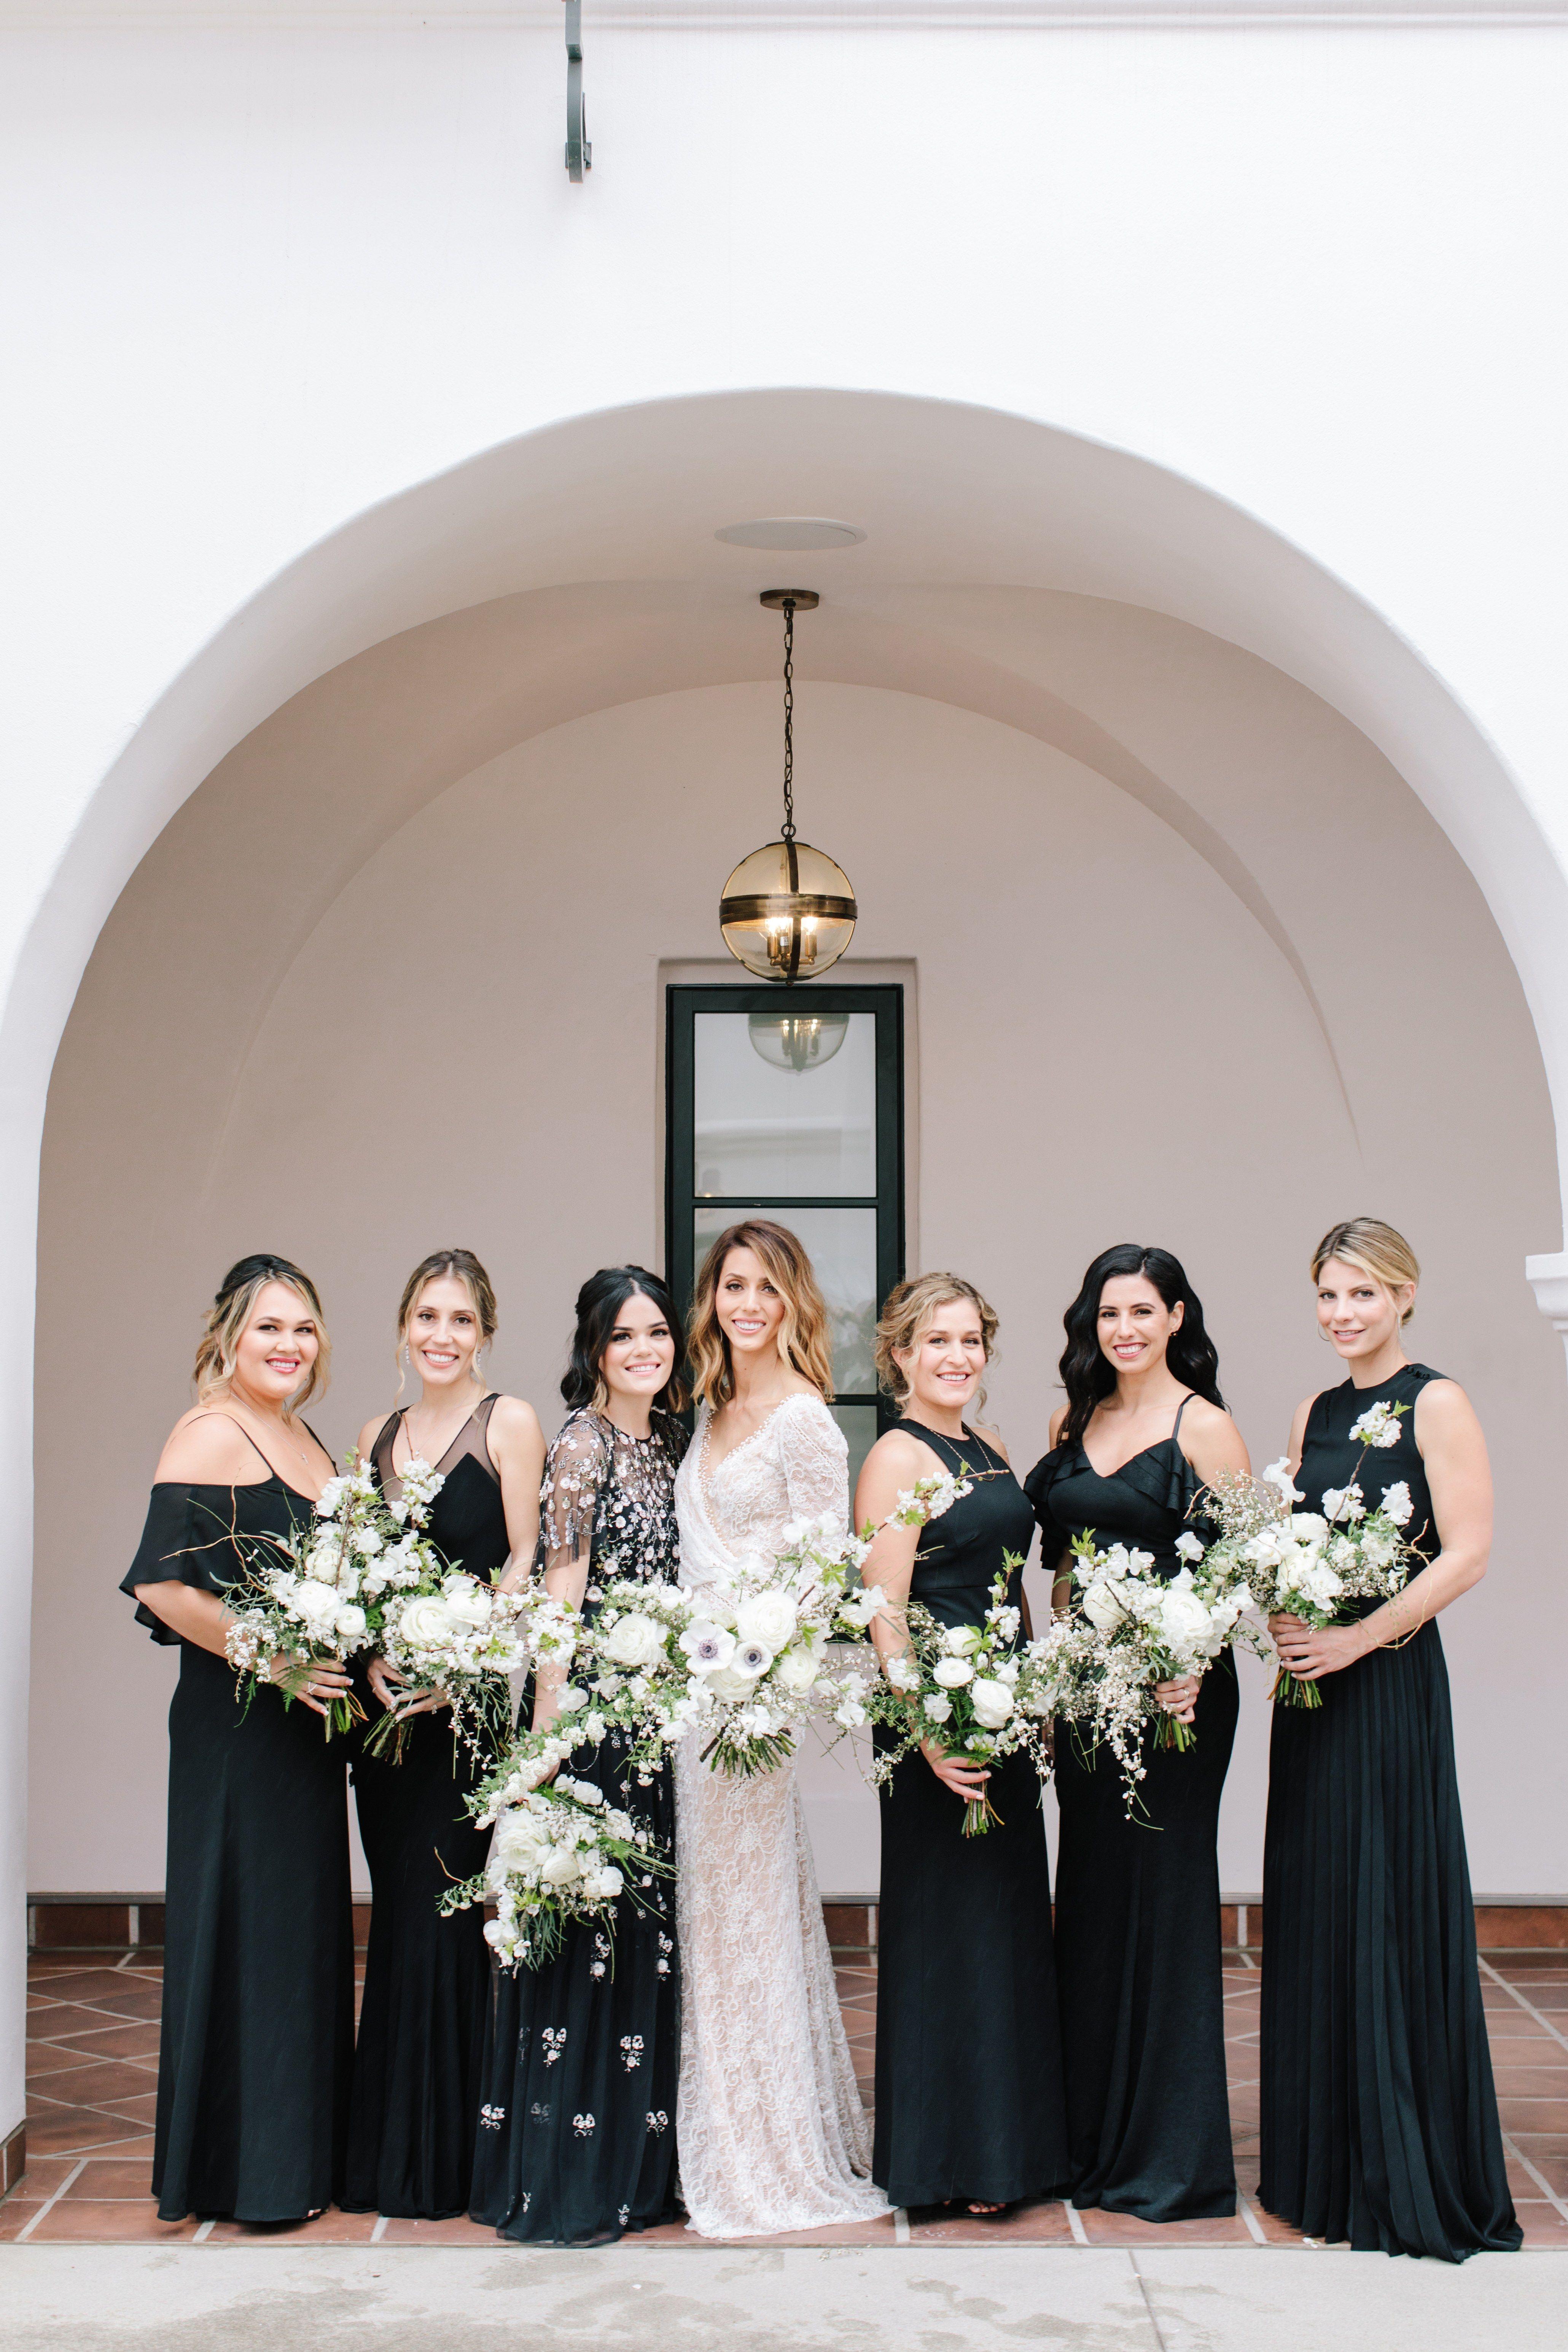 A Black And White Hotel Wedding In Santa Barbara Black Bridesmaid Dresses Floral Bridesmaid Dresses Black Bridesmaid Dress Mismatched [ 6182 x 4121 Pixel ]